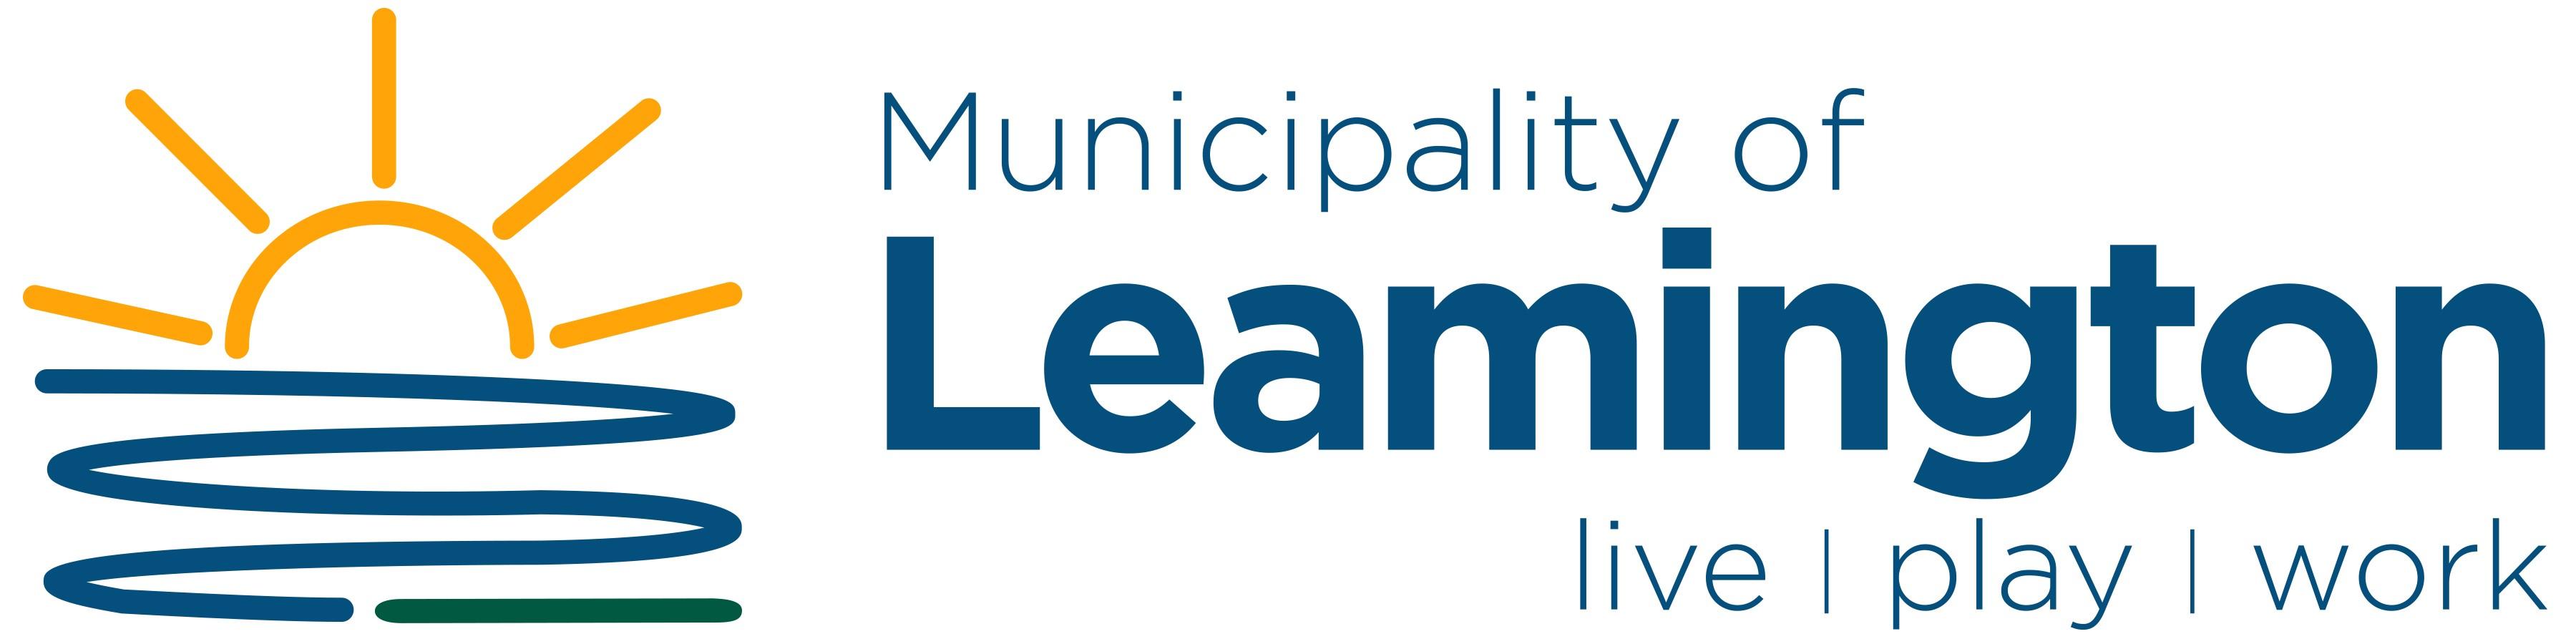 Leamington Logo